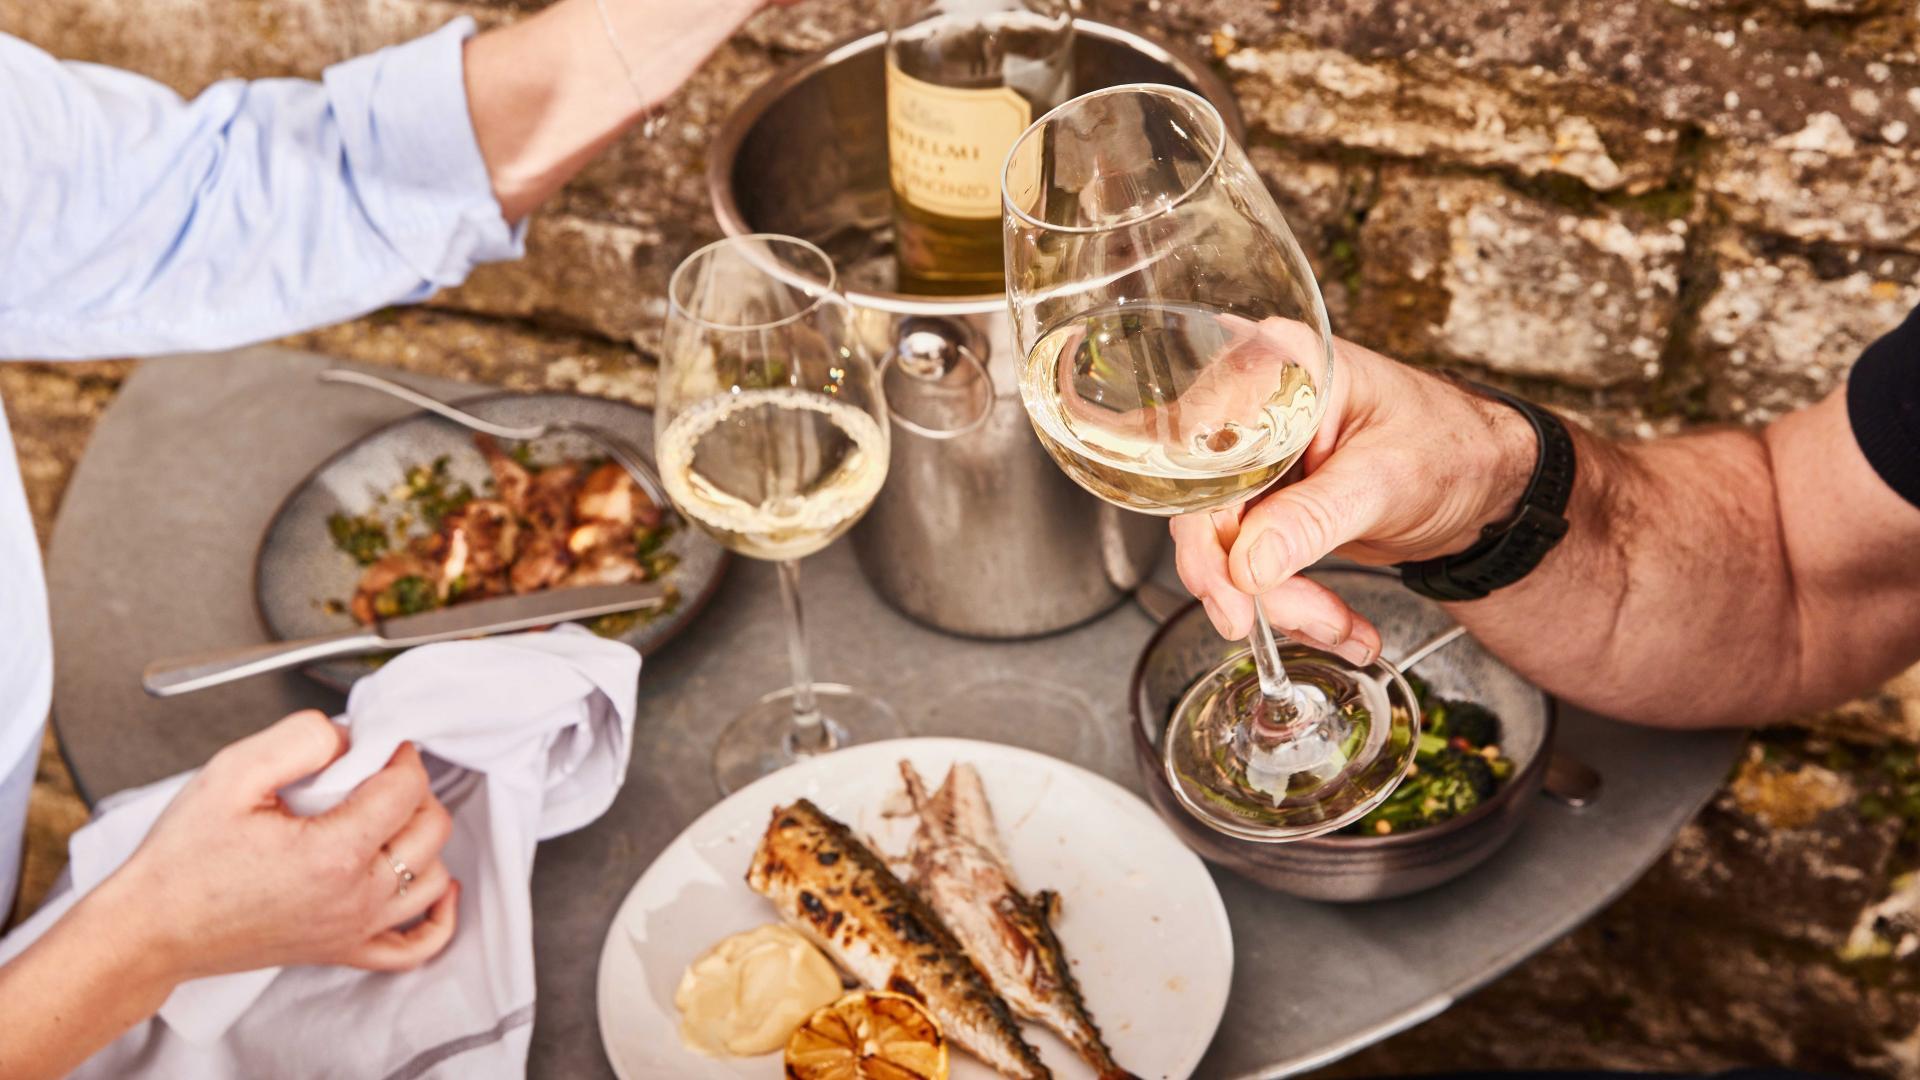 Best restaurants near London: the terrace at Wilding, Oxford